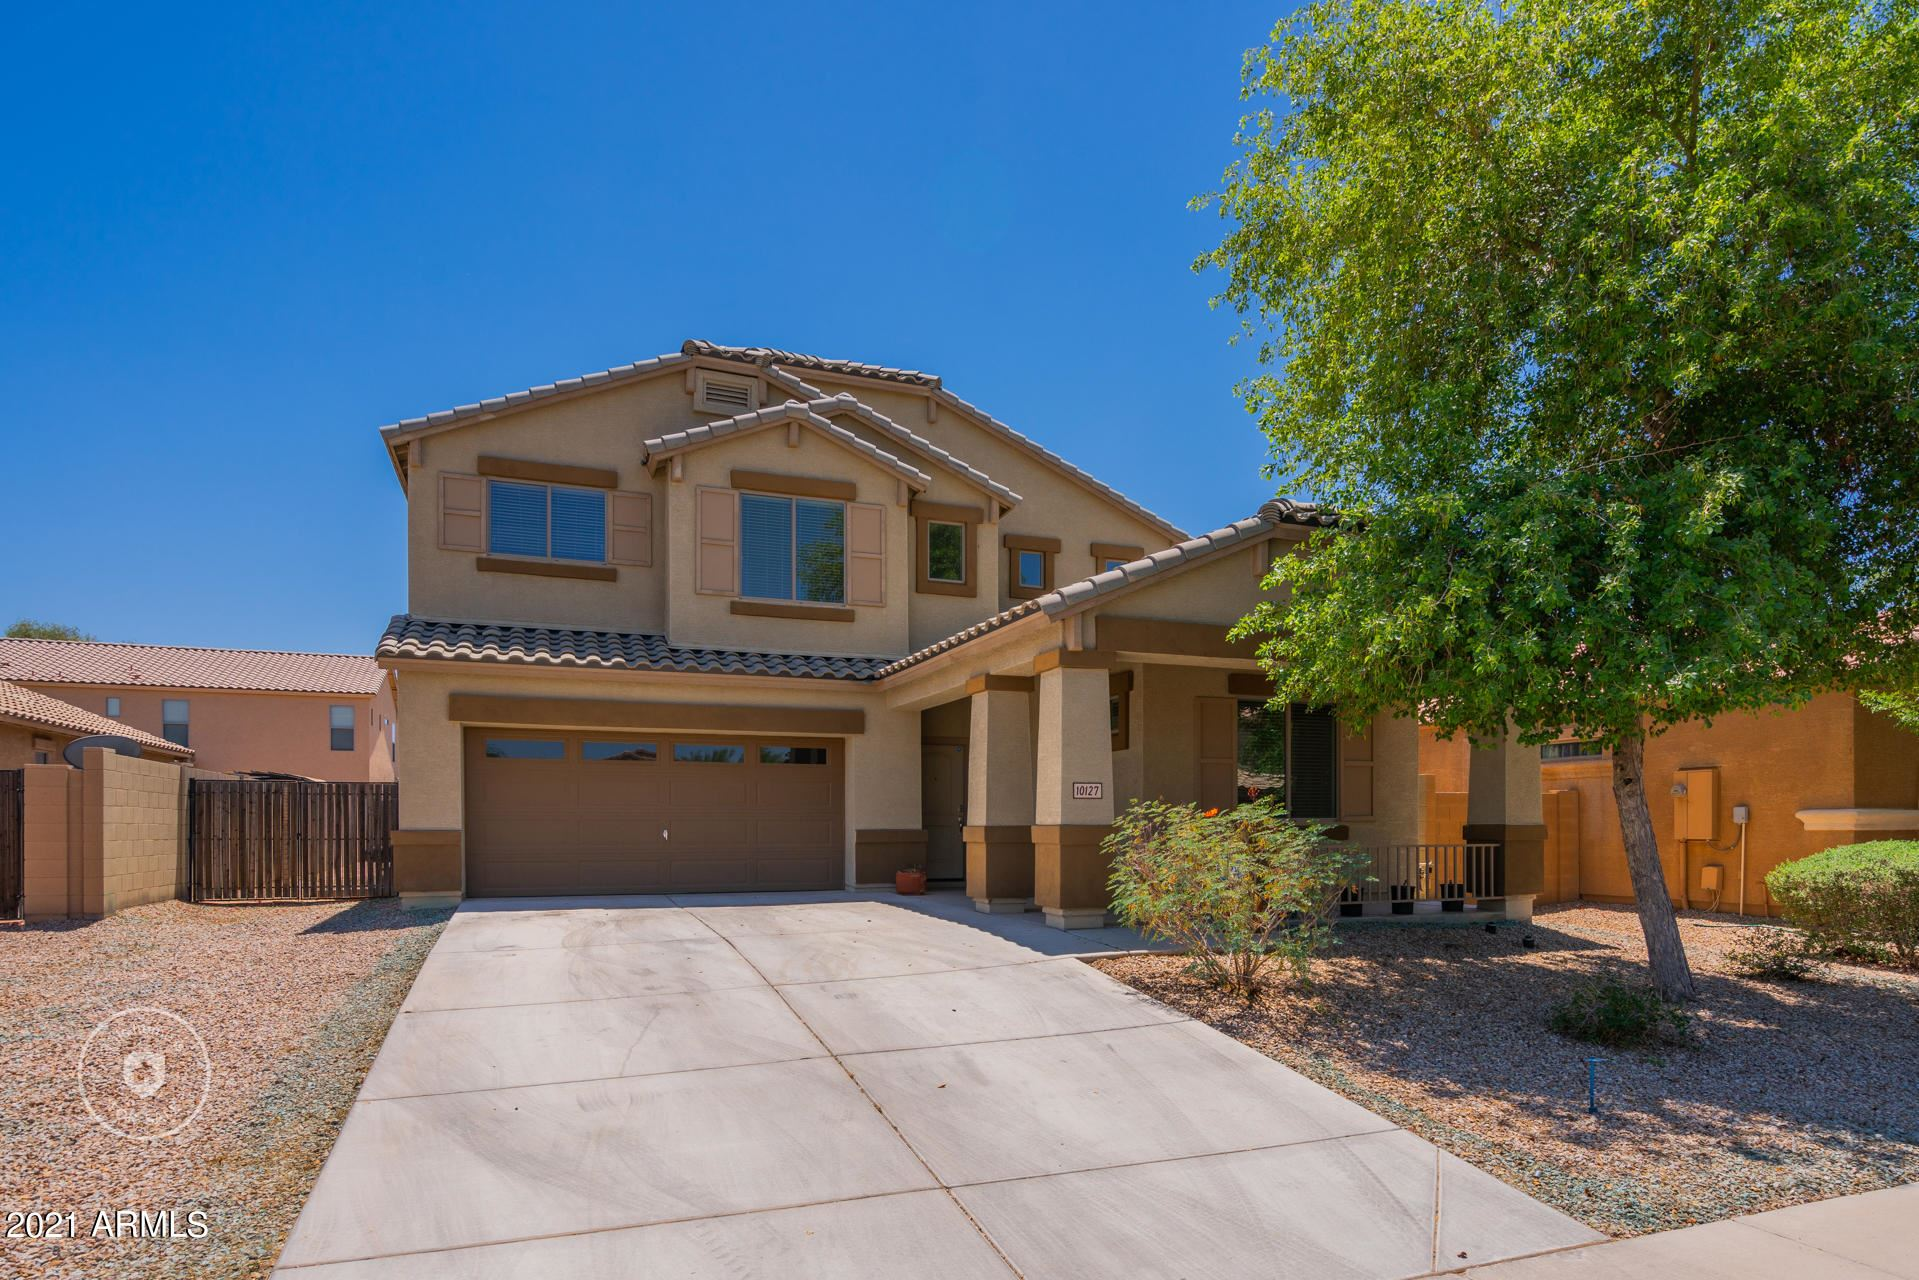 Photo of 10127 W RAYMOND Street, Tolleson, AZ 85353 (MLS # 6233983)